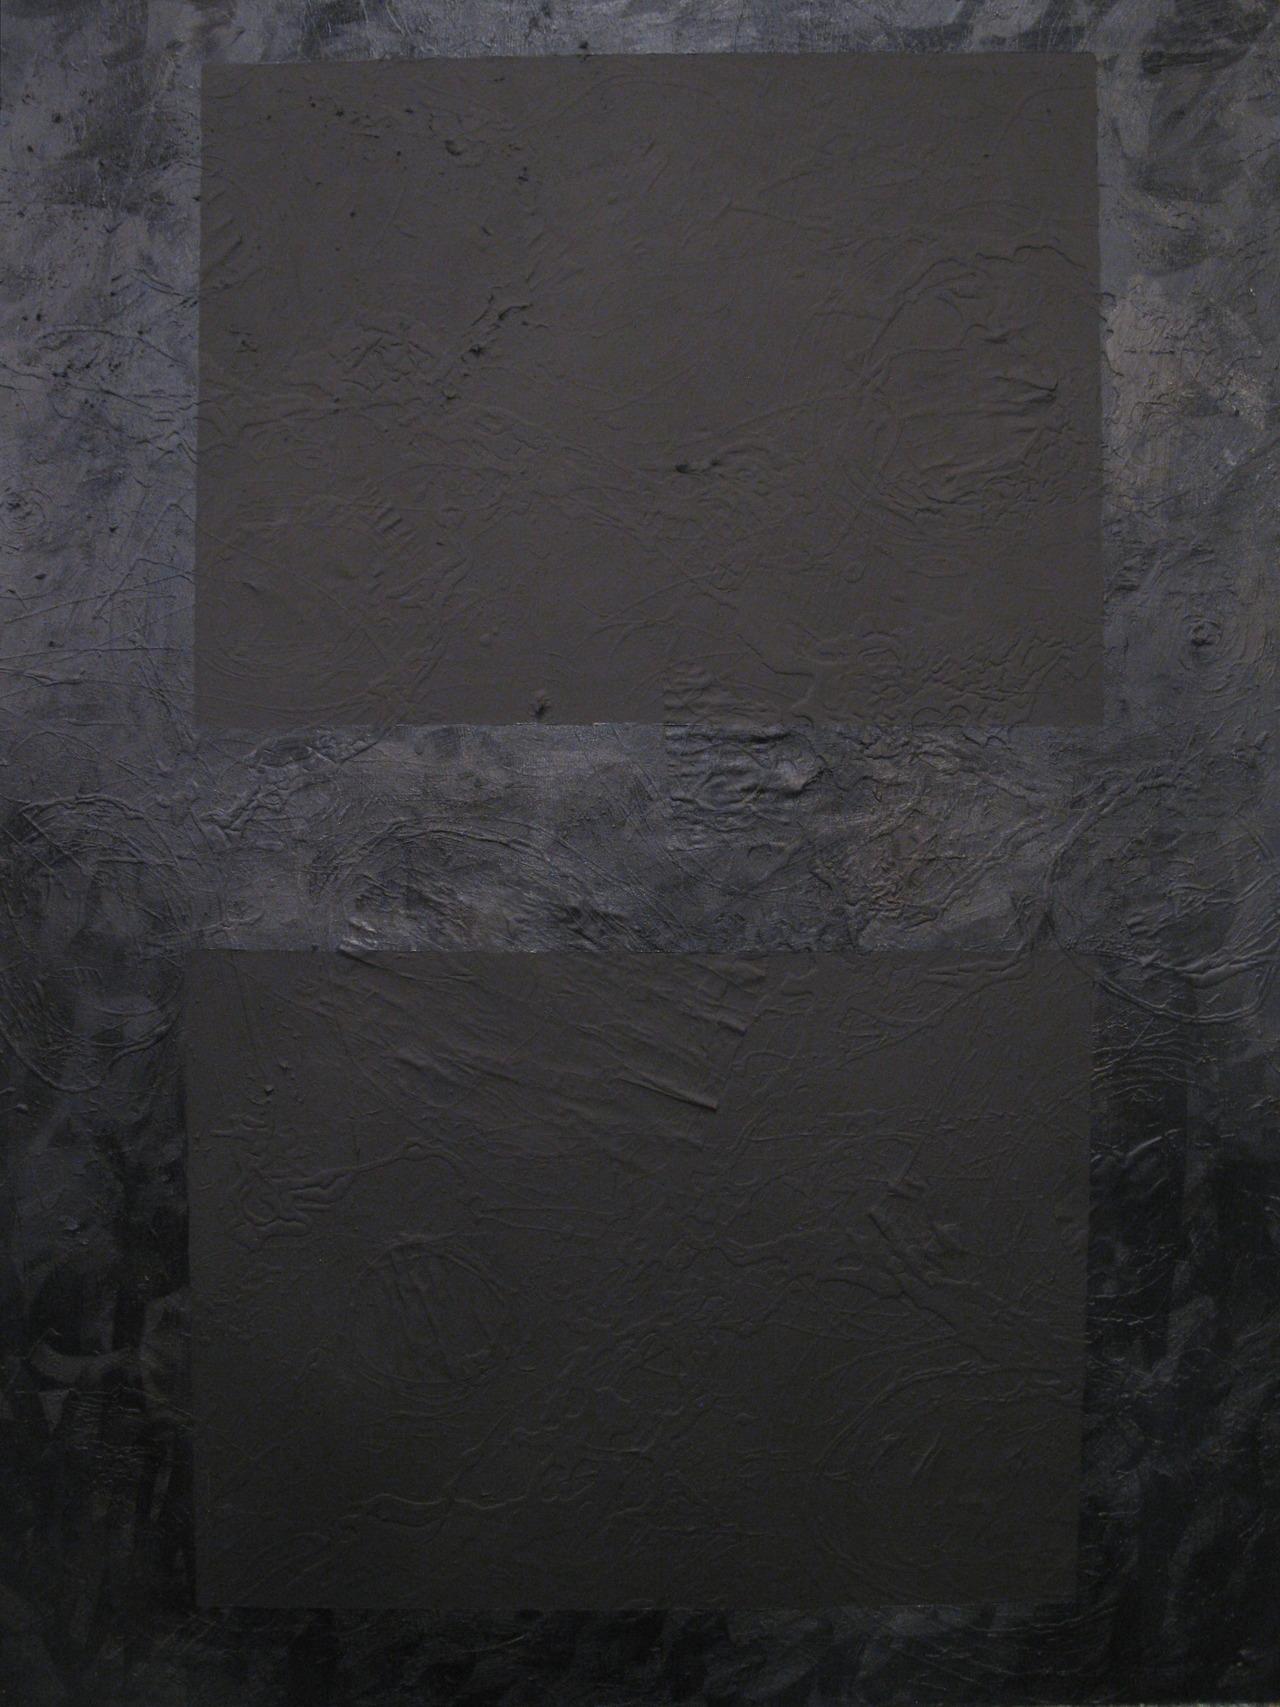 When Tony Smith Met Richard Serra